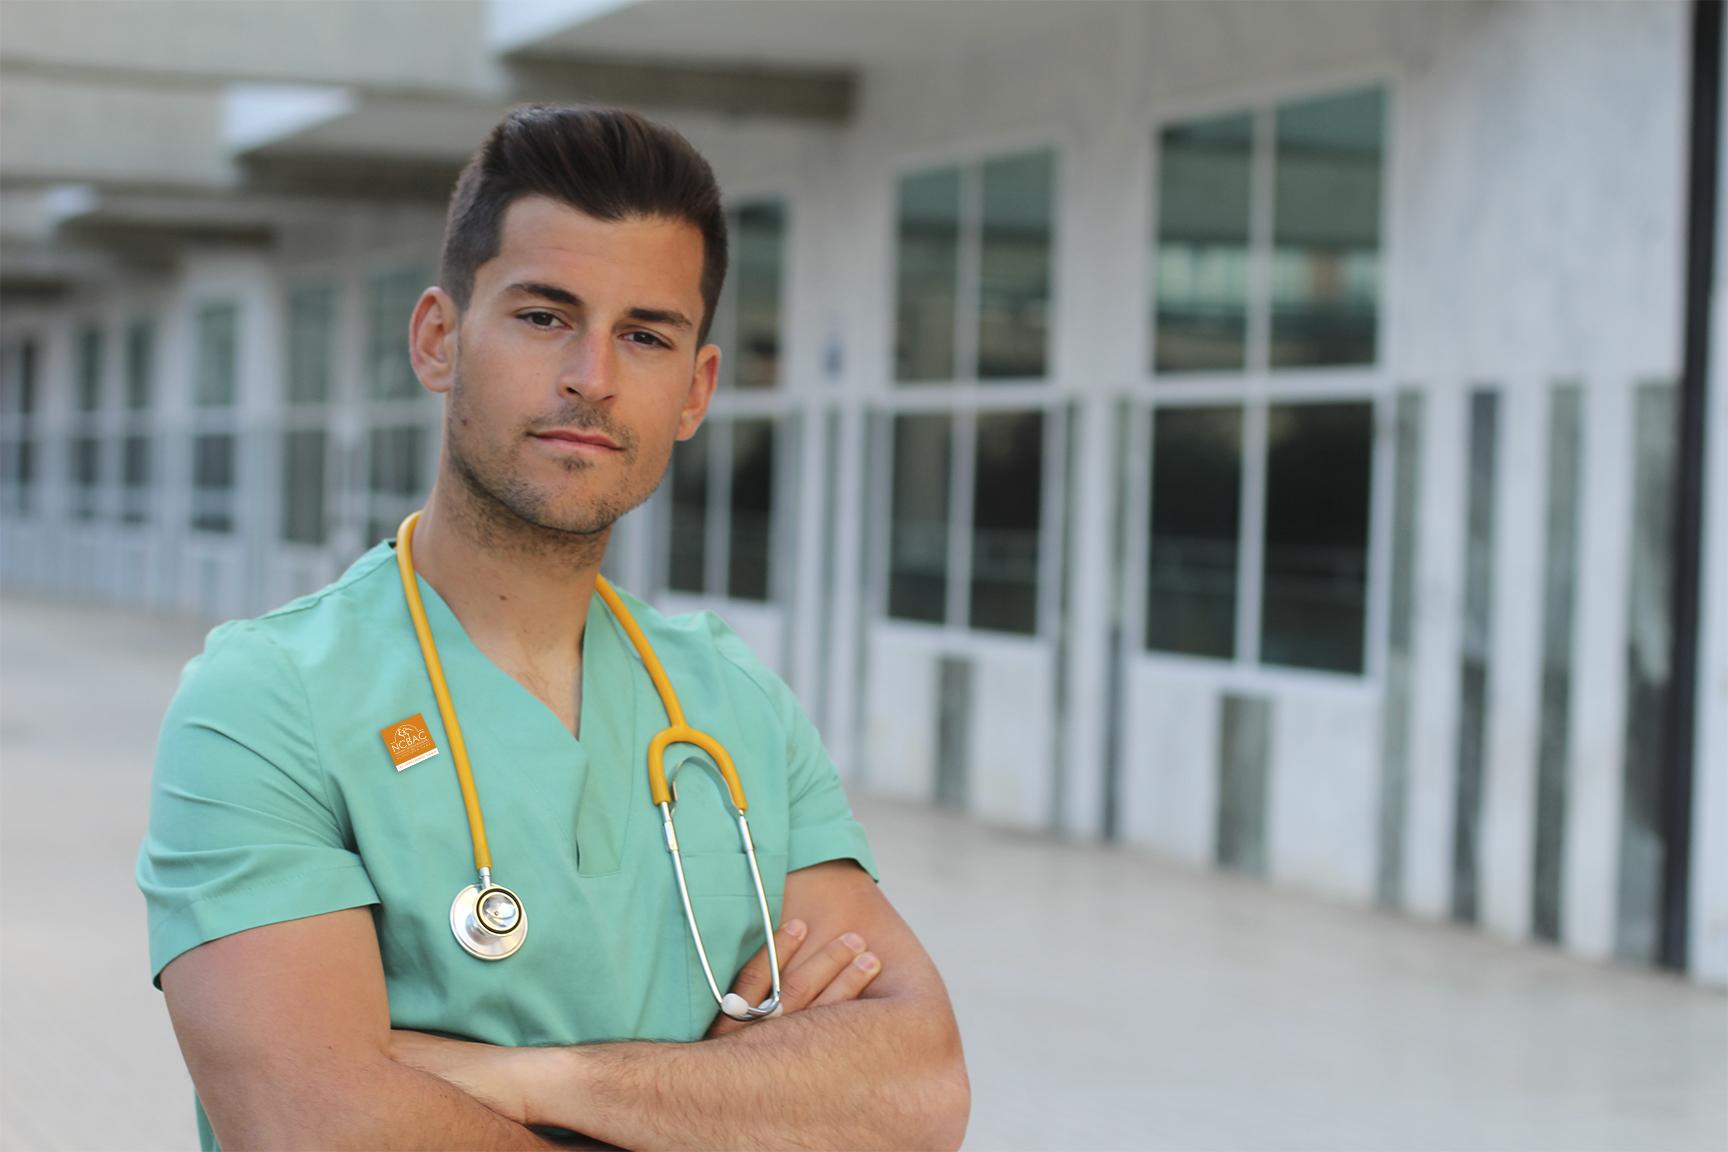 nurse-male-scrubs-CAC-pin.jpg